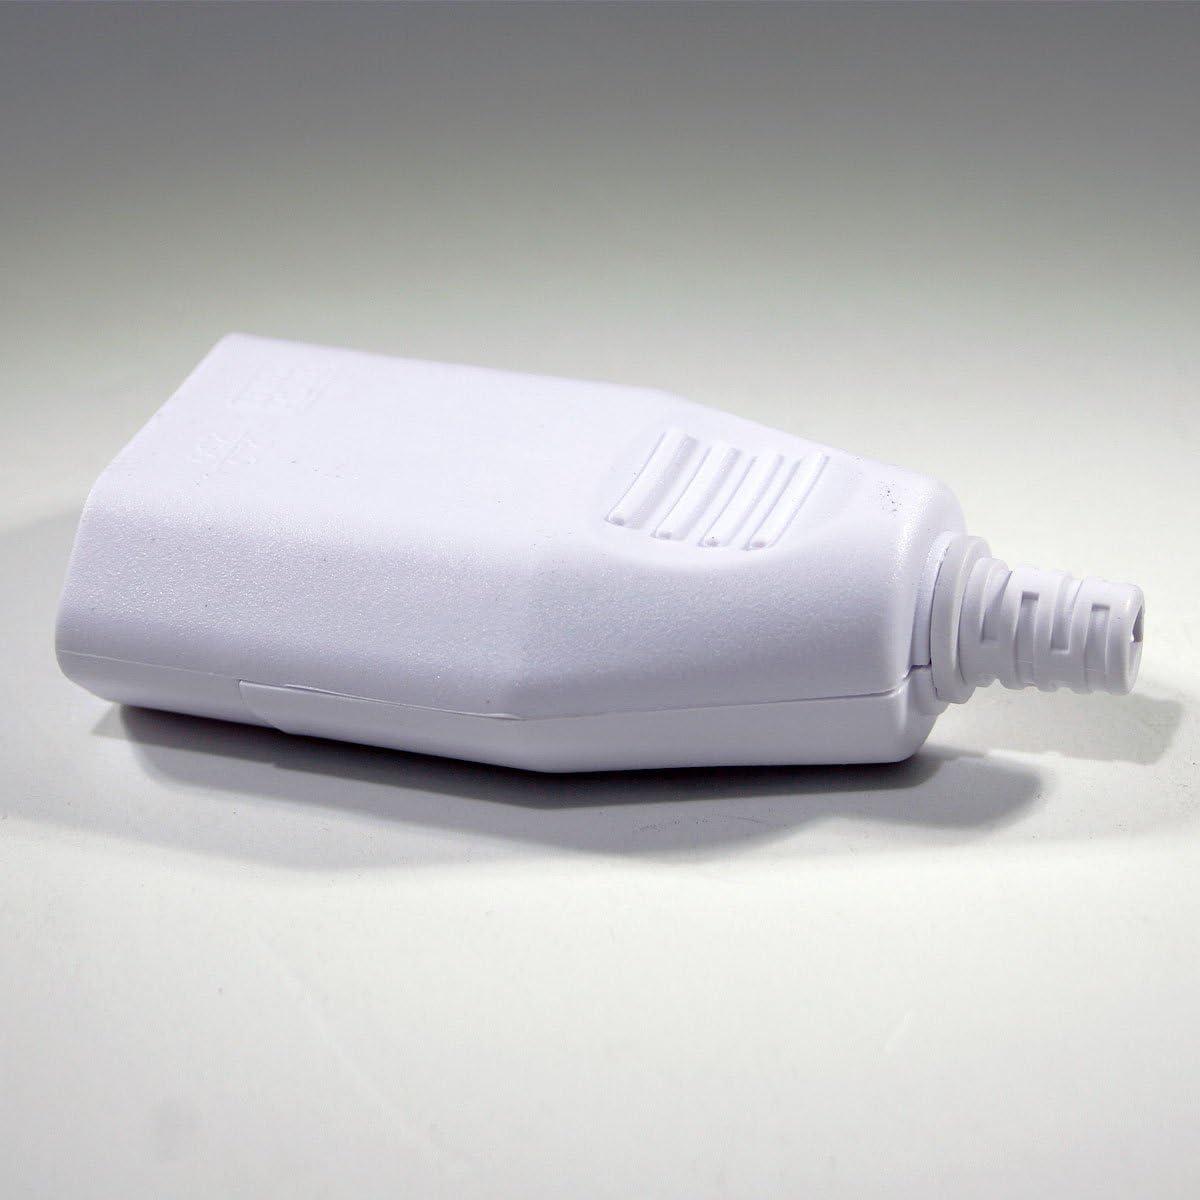 250/V//2,5/A 5 St/ück Kupplung max LEurope Raccord plastique blanc